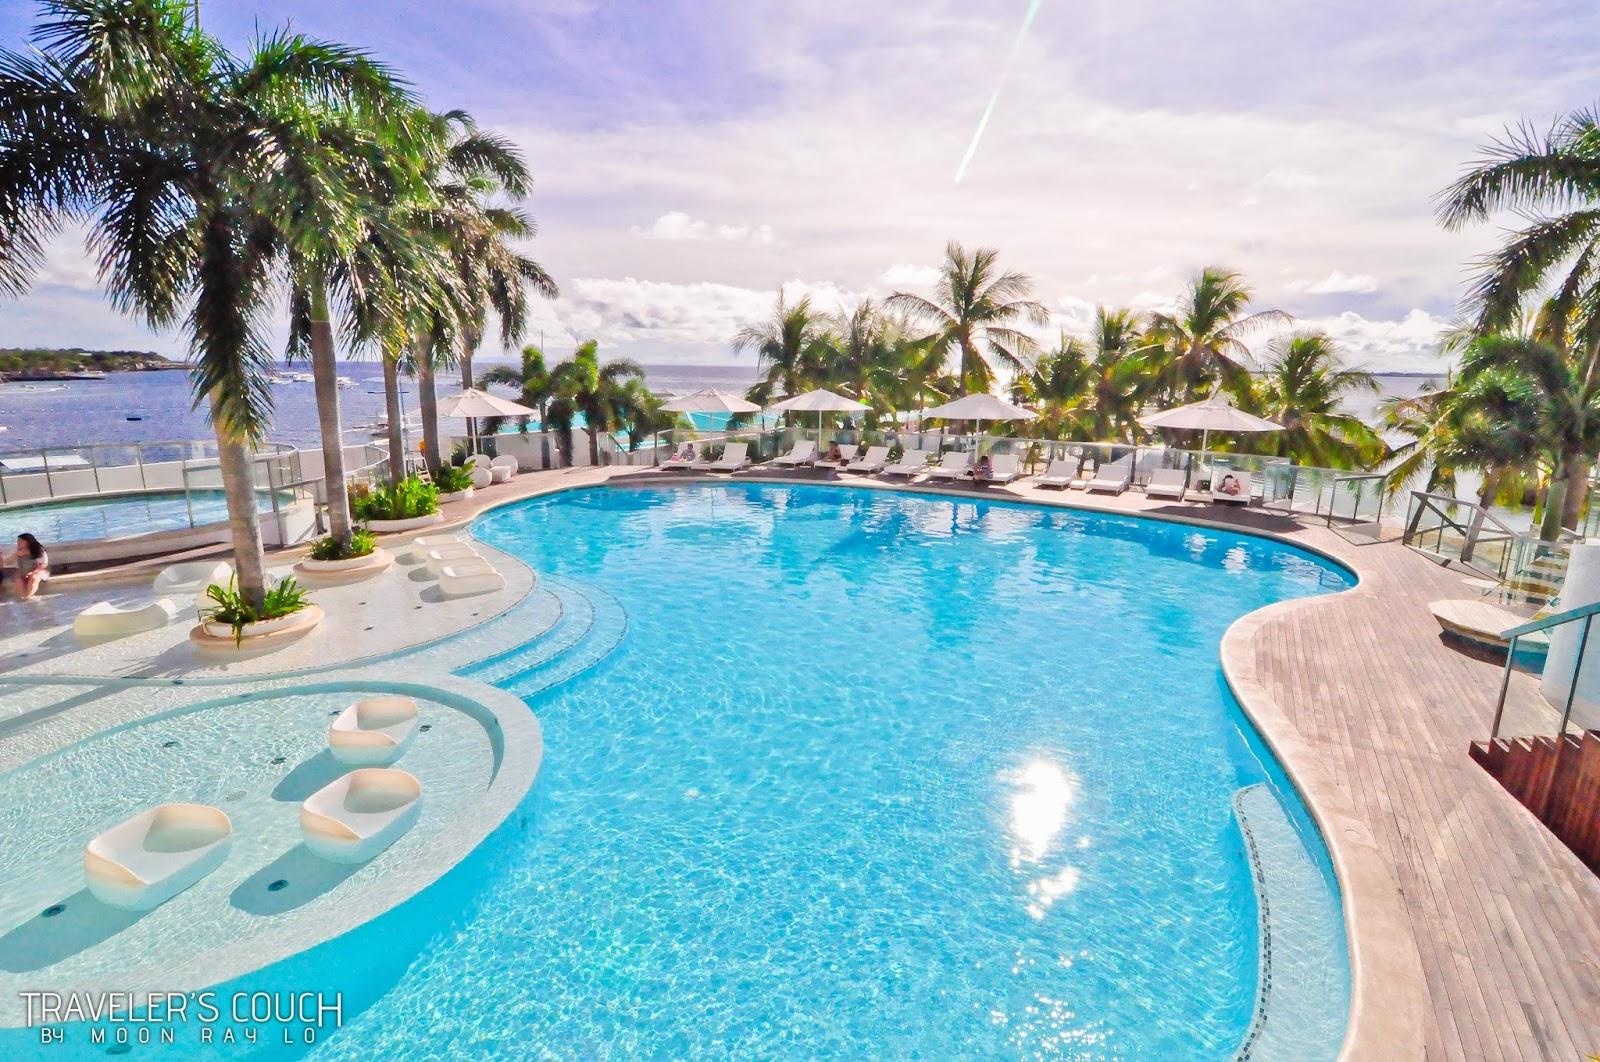 Moevenpick Hotel Mactan Island Cebu Experience Cebu 39 S